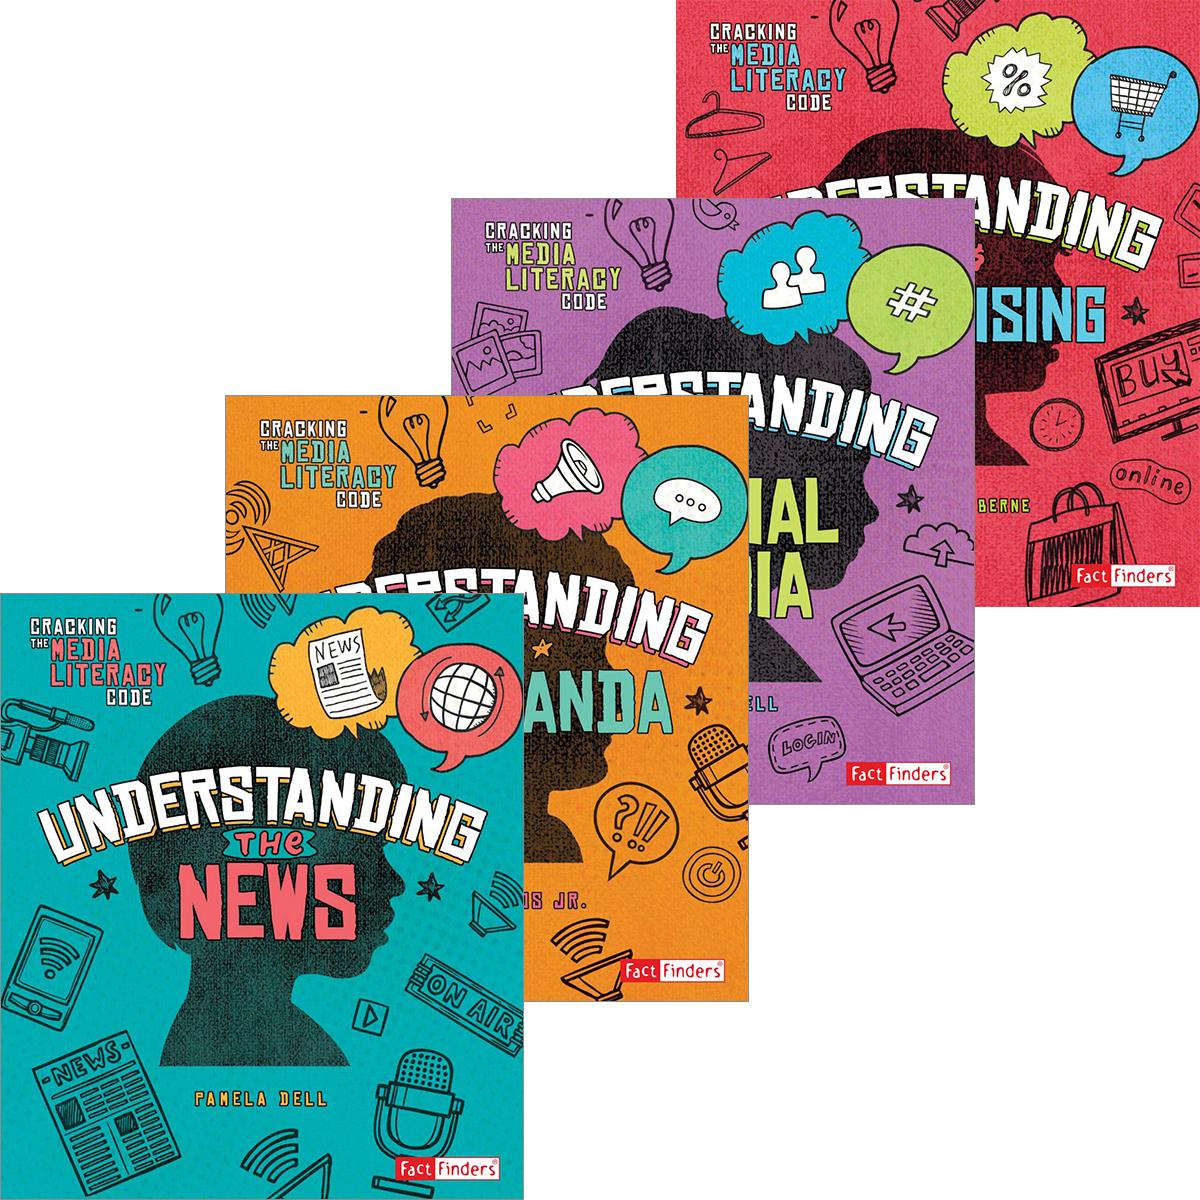 Capstone Cracking the Media Literacy Code 4-Pack